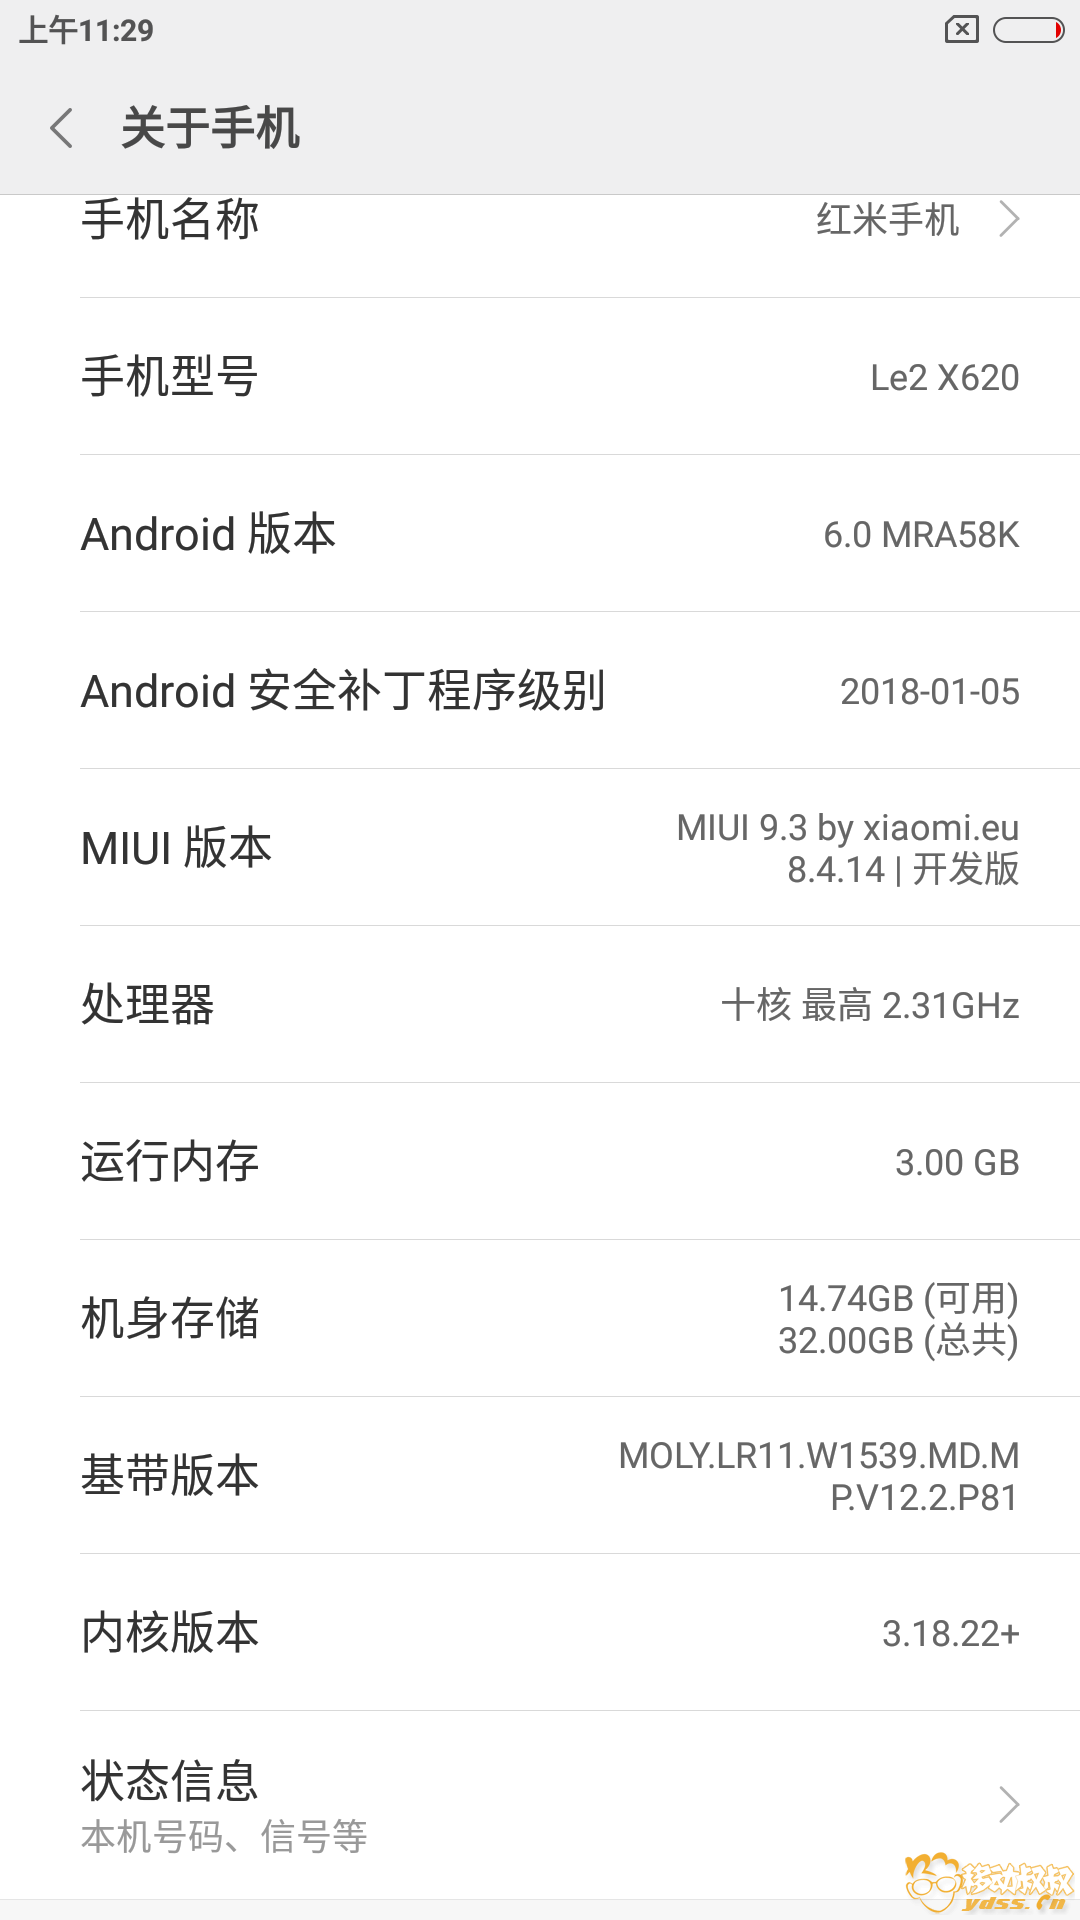 Screenshot_2018-04-15-11-29-35-875_com.android.settings.png